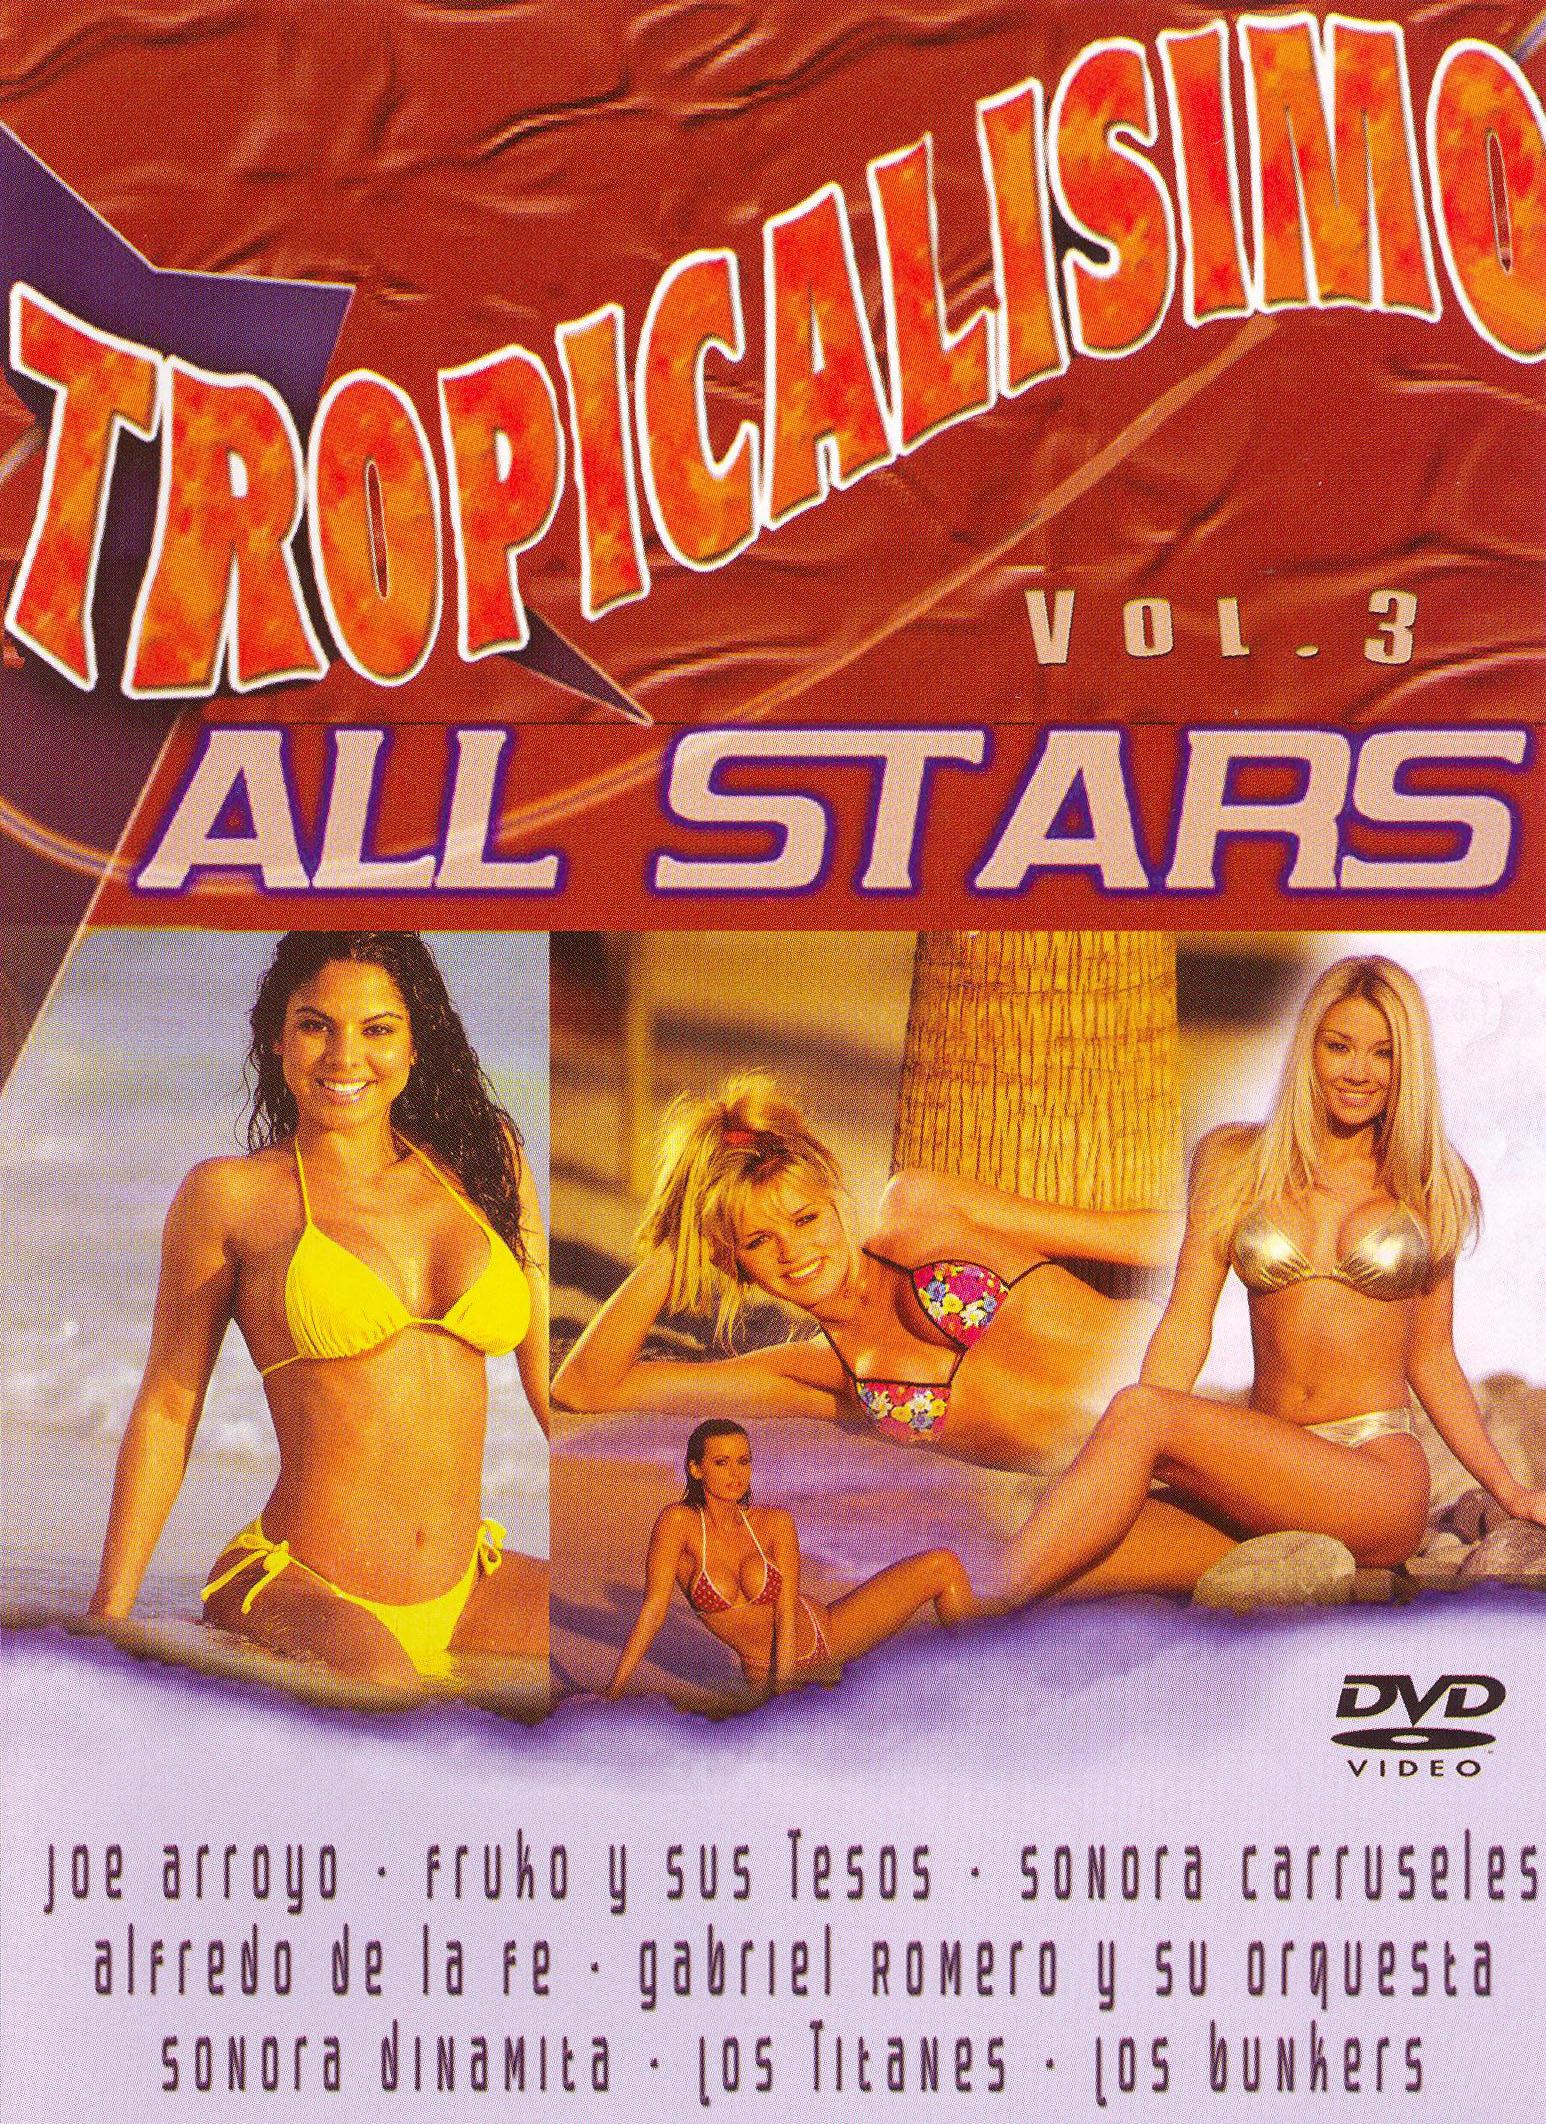 Tropicalisimo All Stars, Vol. 3